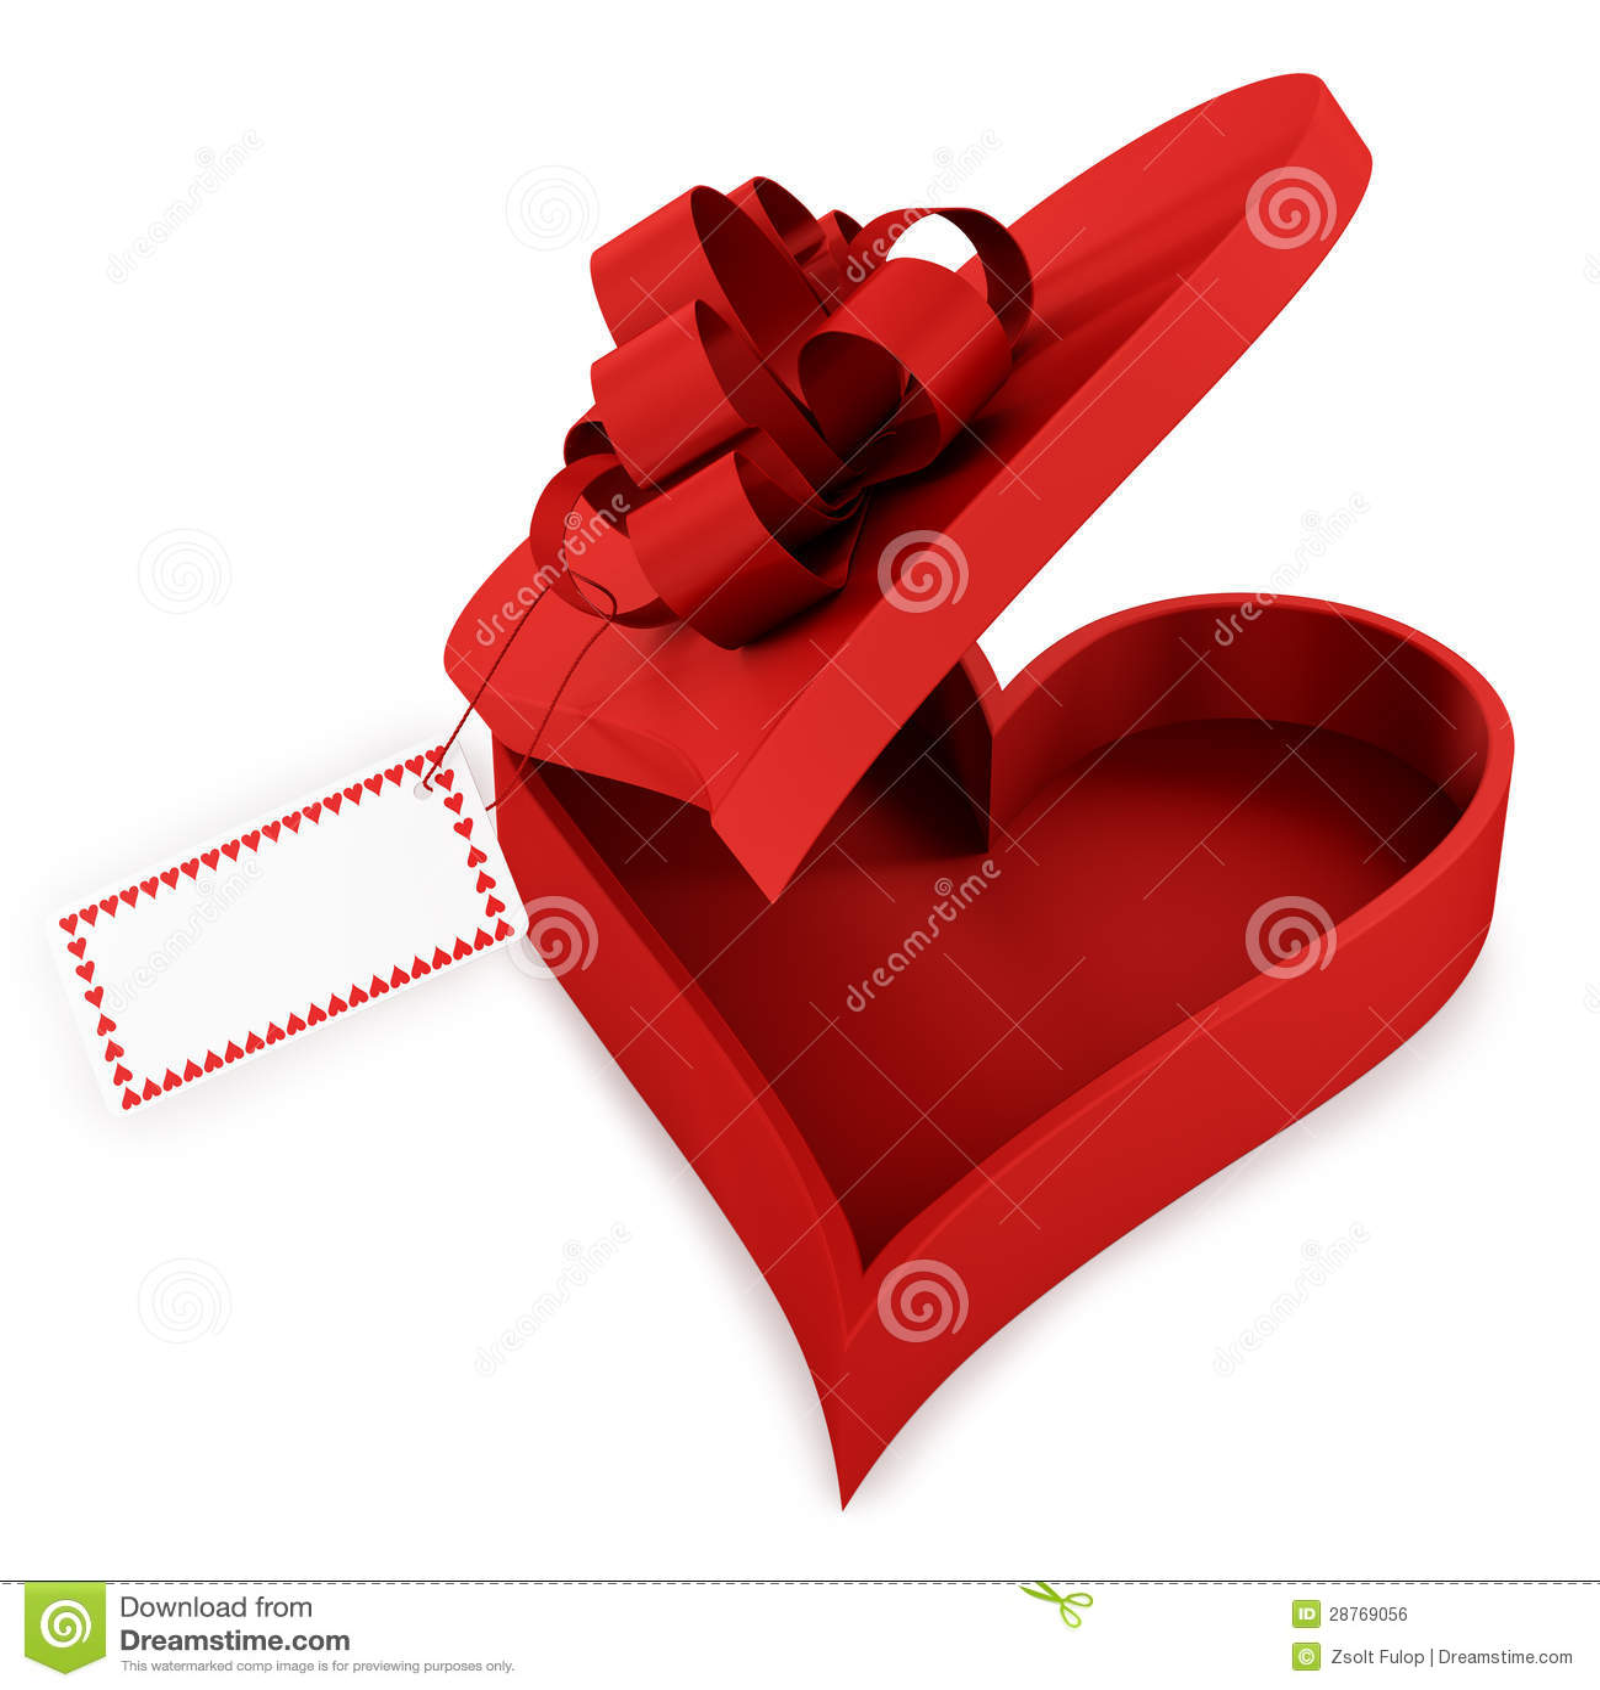 Heart Shaped Gift Box Royalty Free Stock Image - Image: 28769056